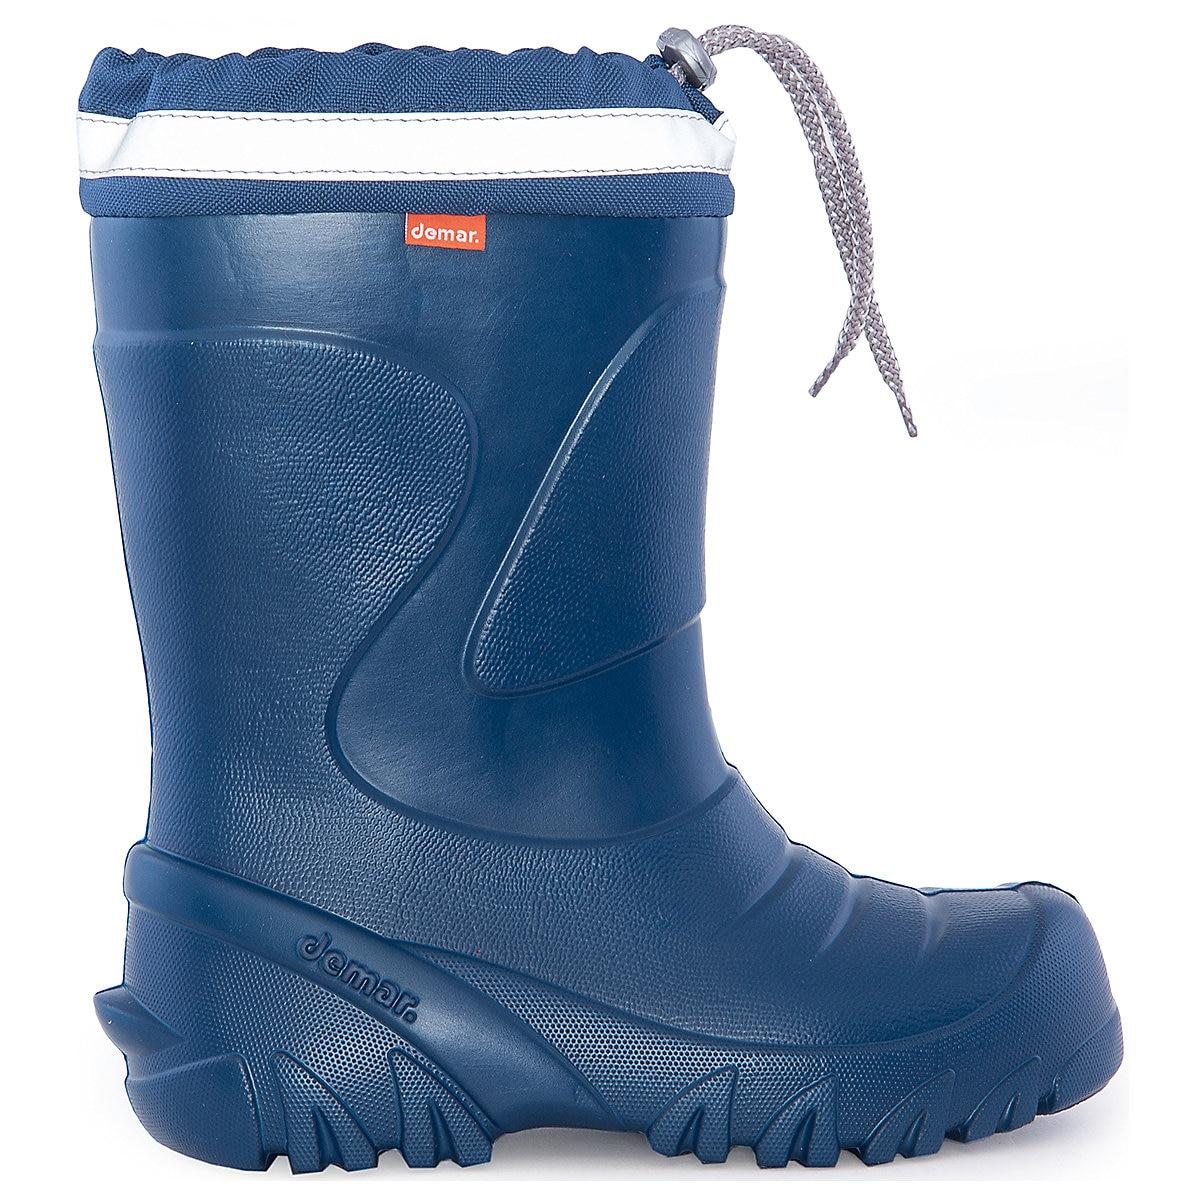 DEMAR Boots 4948826 boys All Seasons Rubber Children shoes boy demar boots 4948841 boys all seasons rubber baby shoes boy